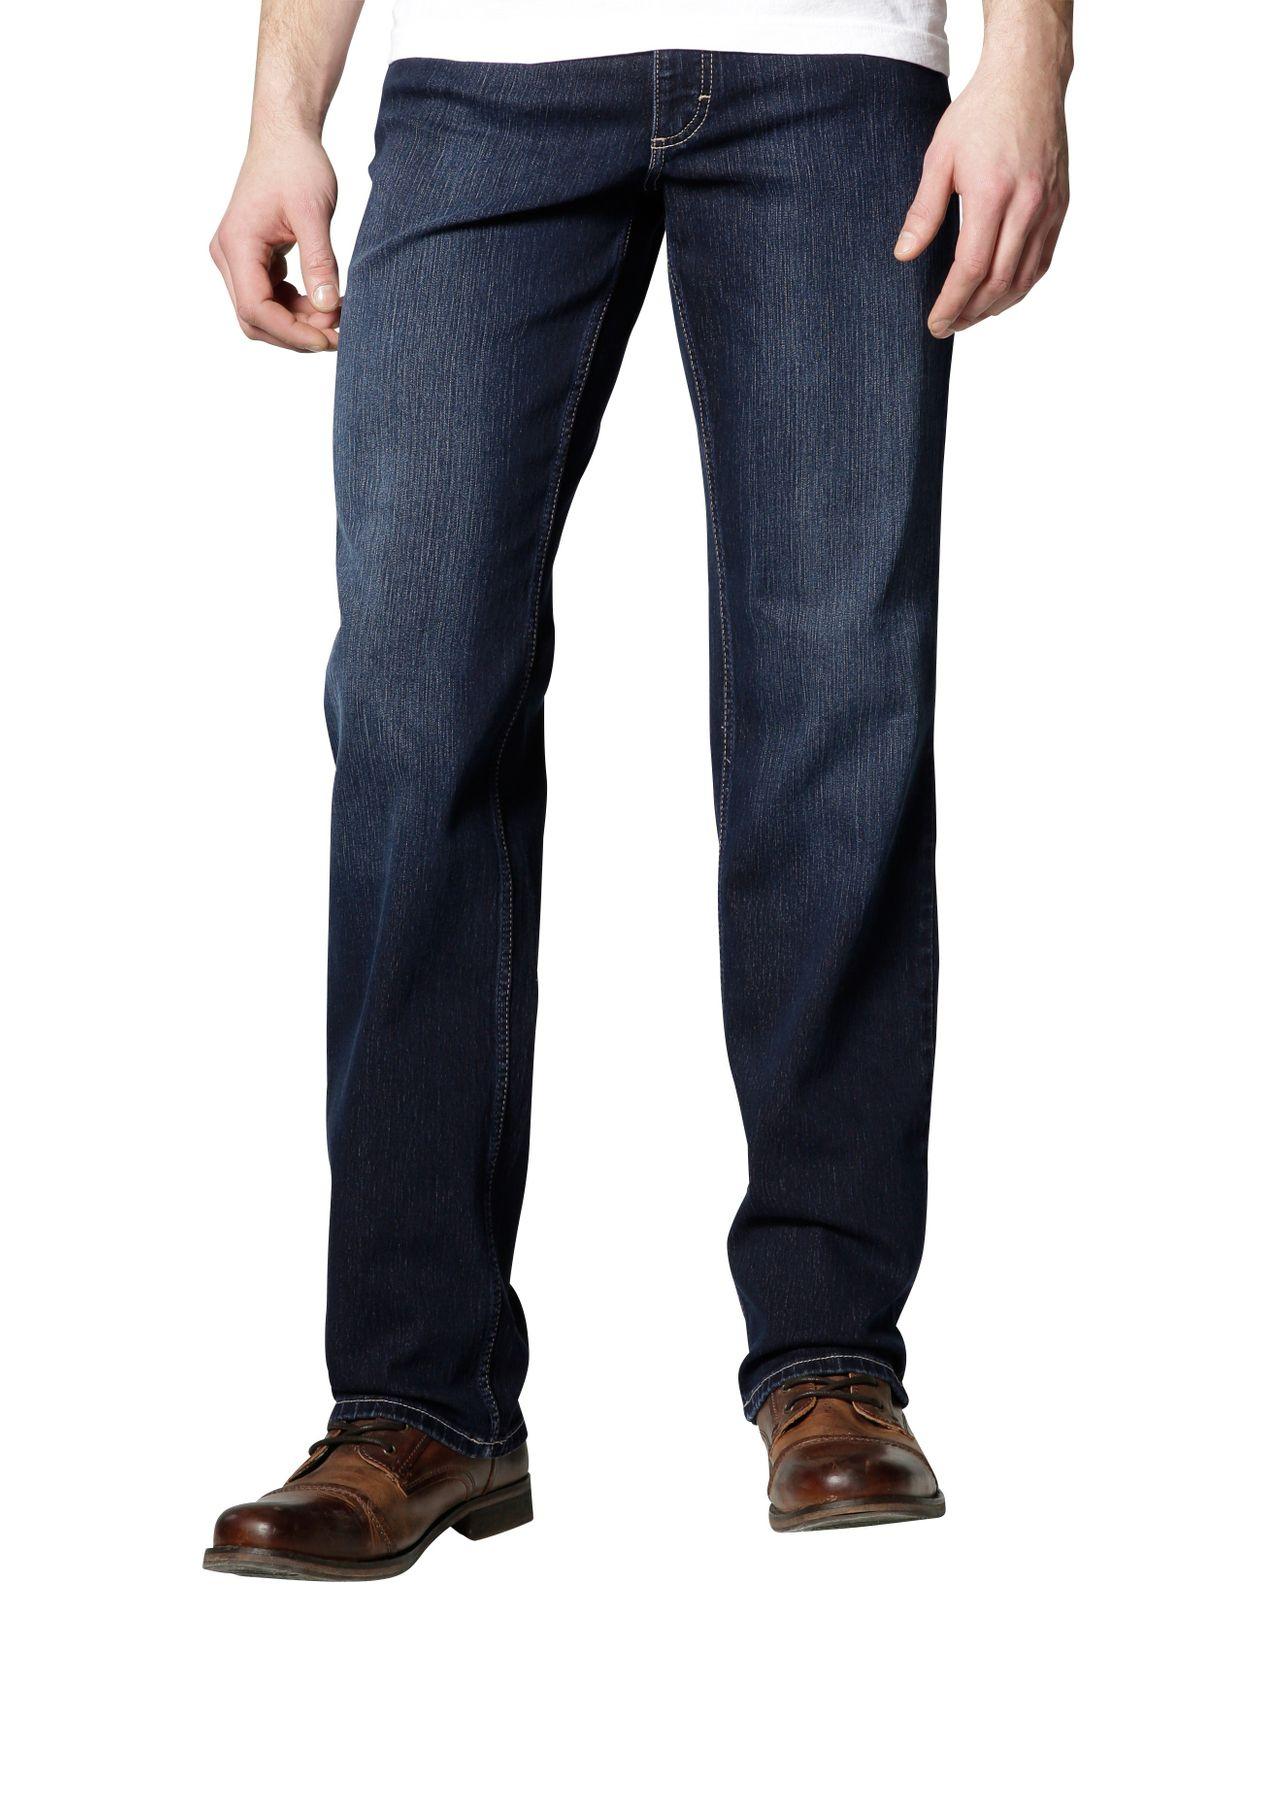 Mustang -  Herren 5-Pocket Jeans, Medium rise/Straight Leg, Farbe old stone used, Big Sur (3169-5126-580) – Bild 1